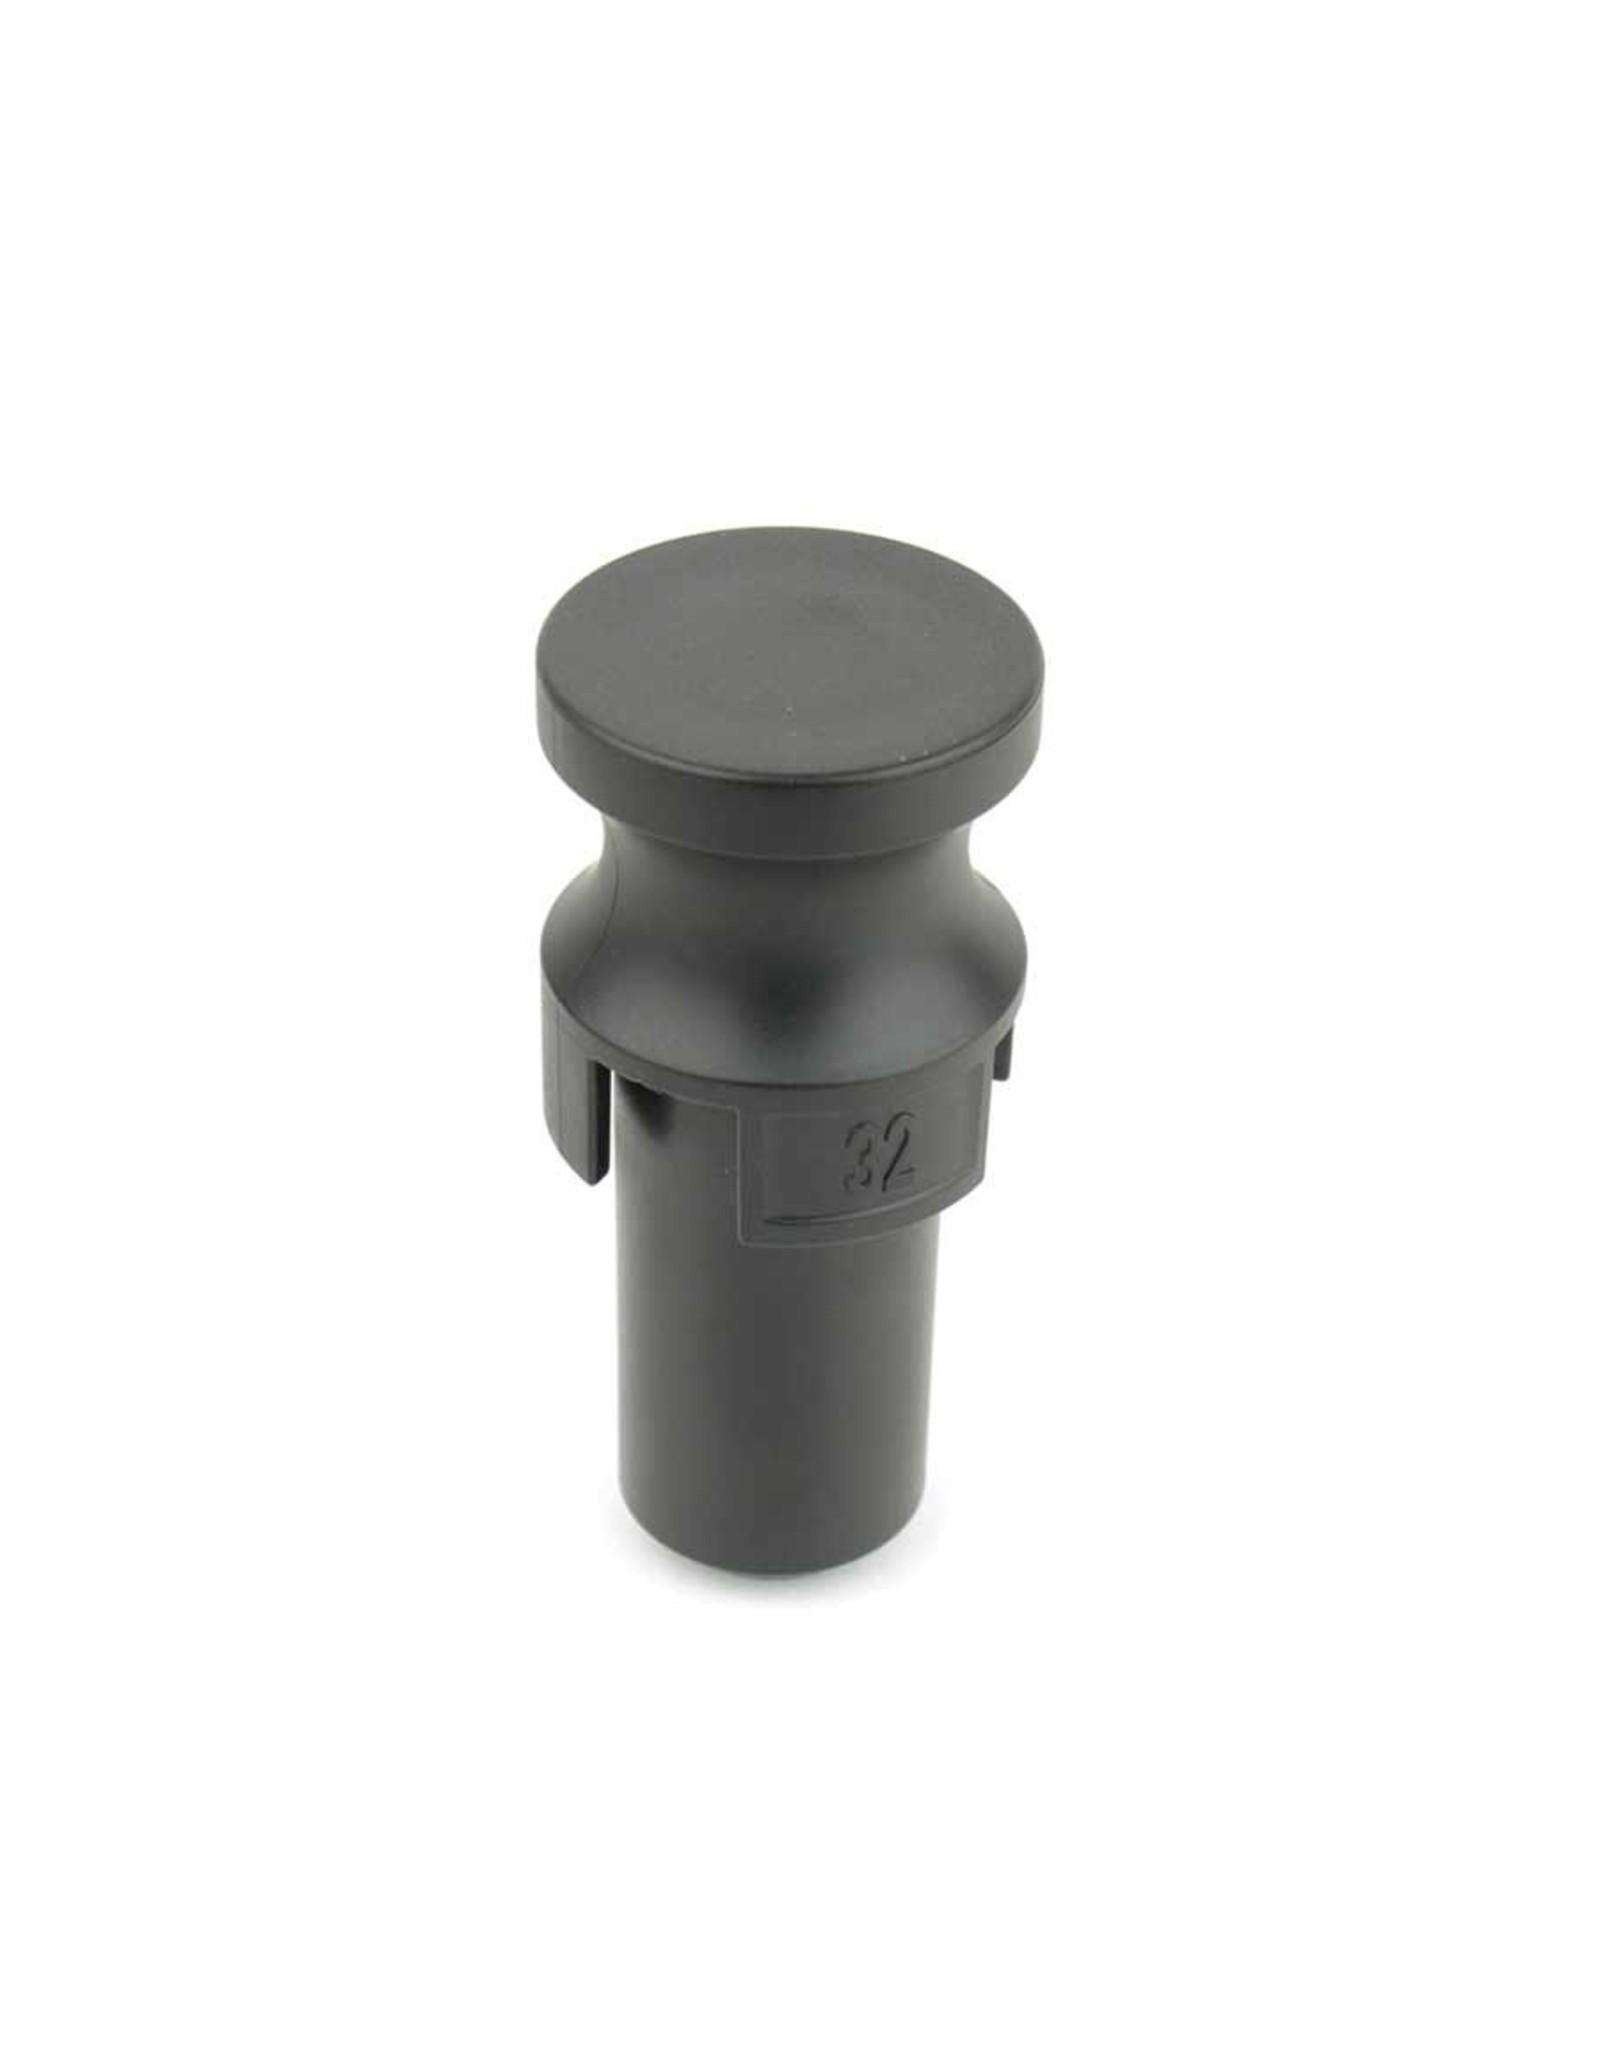 32mm Dust Seal Installation Tool